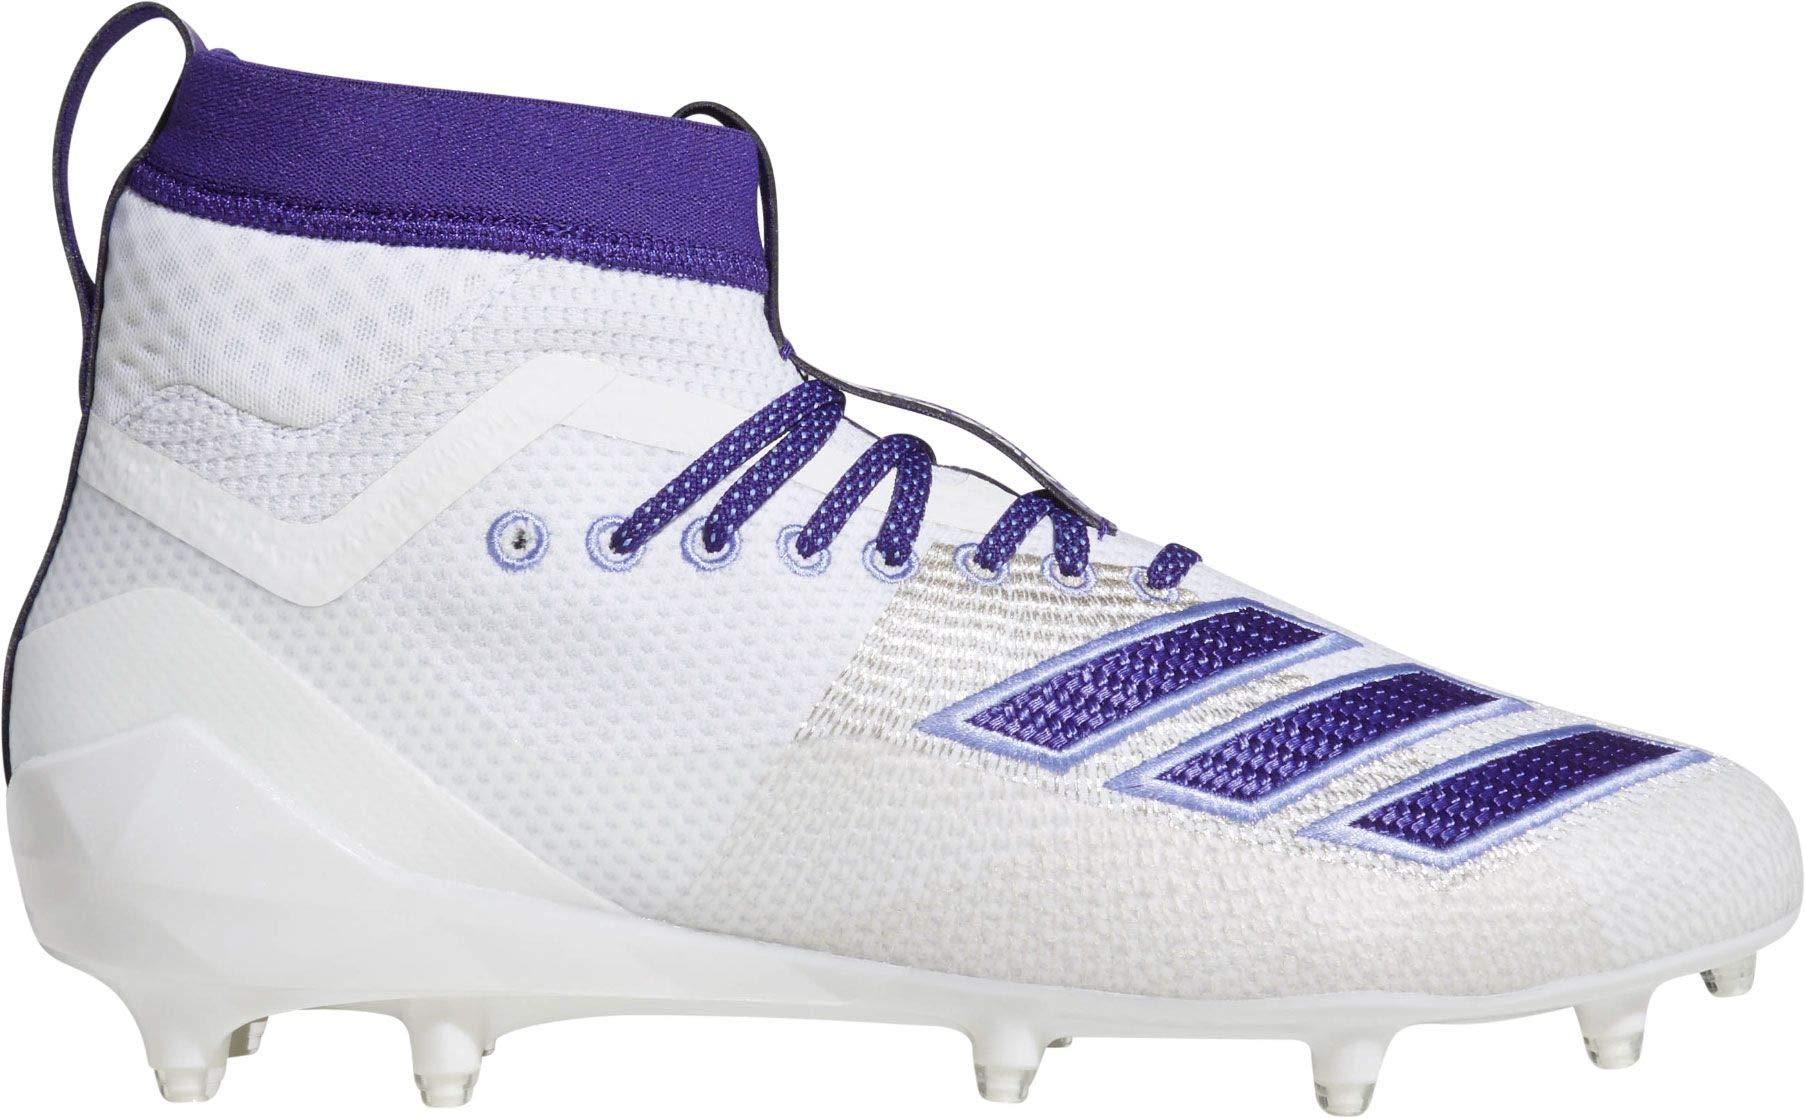 adidas Men's Adizero 8.0 SK Football Shoe, White/Collegiate Chalk Purple, 6.5 M US